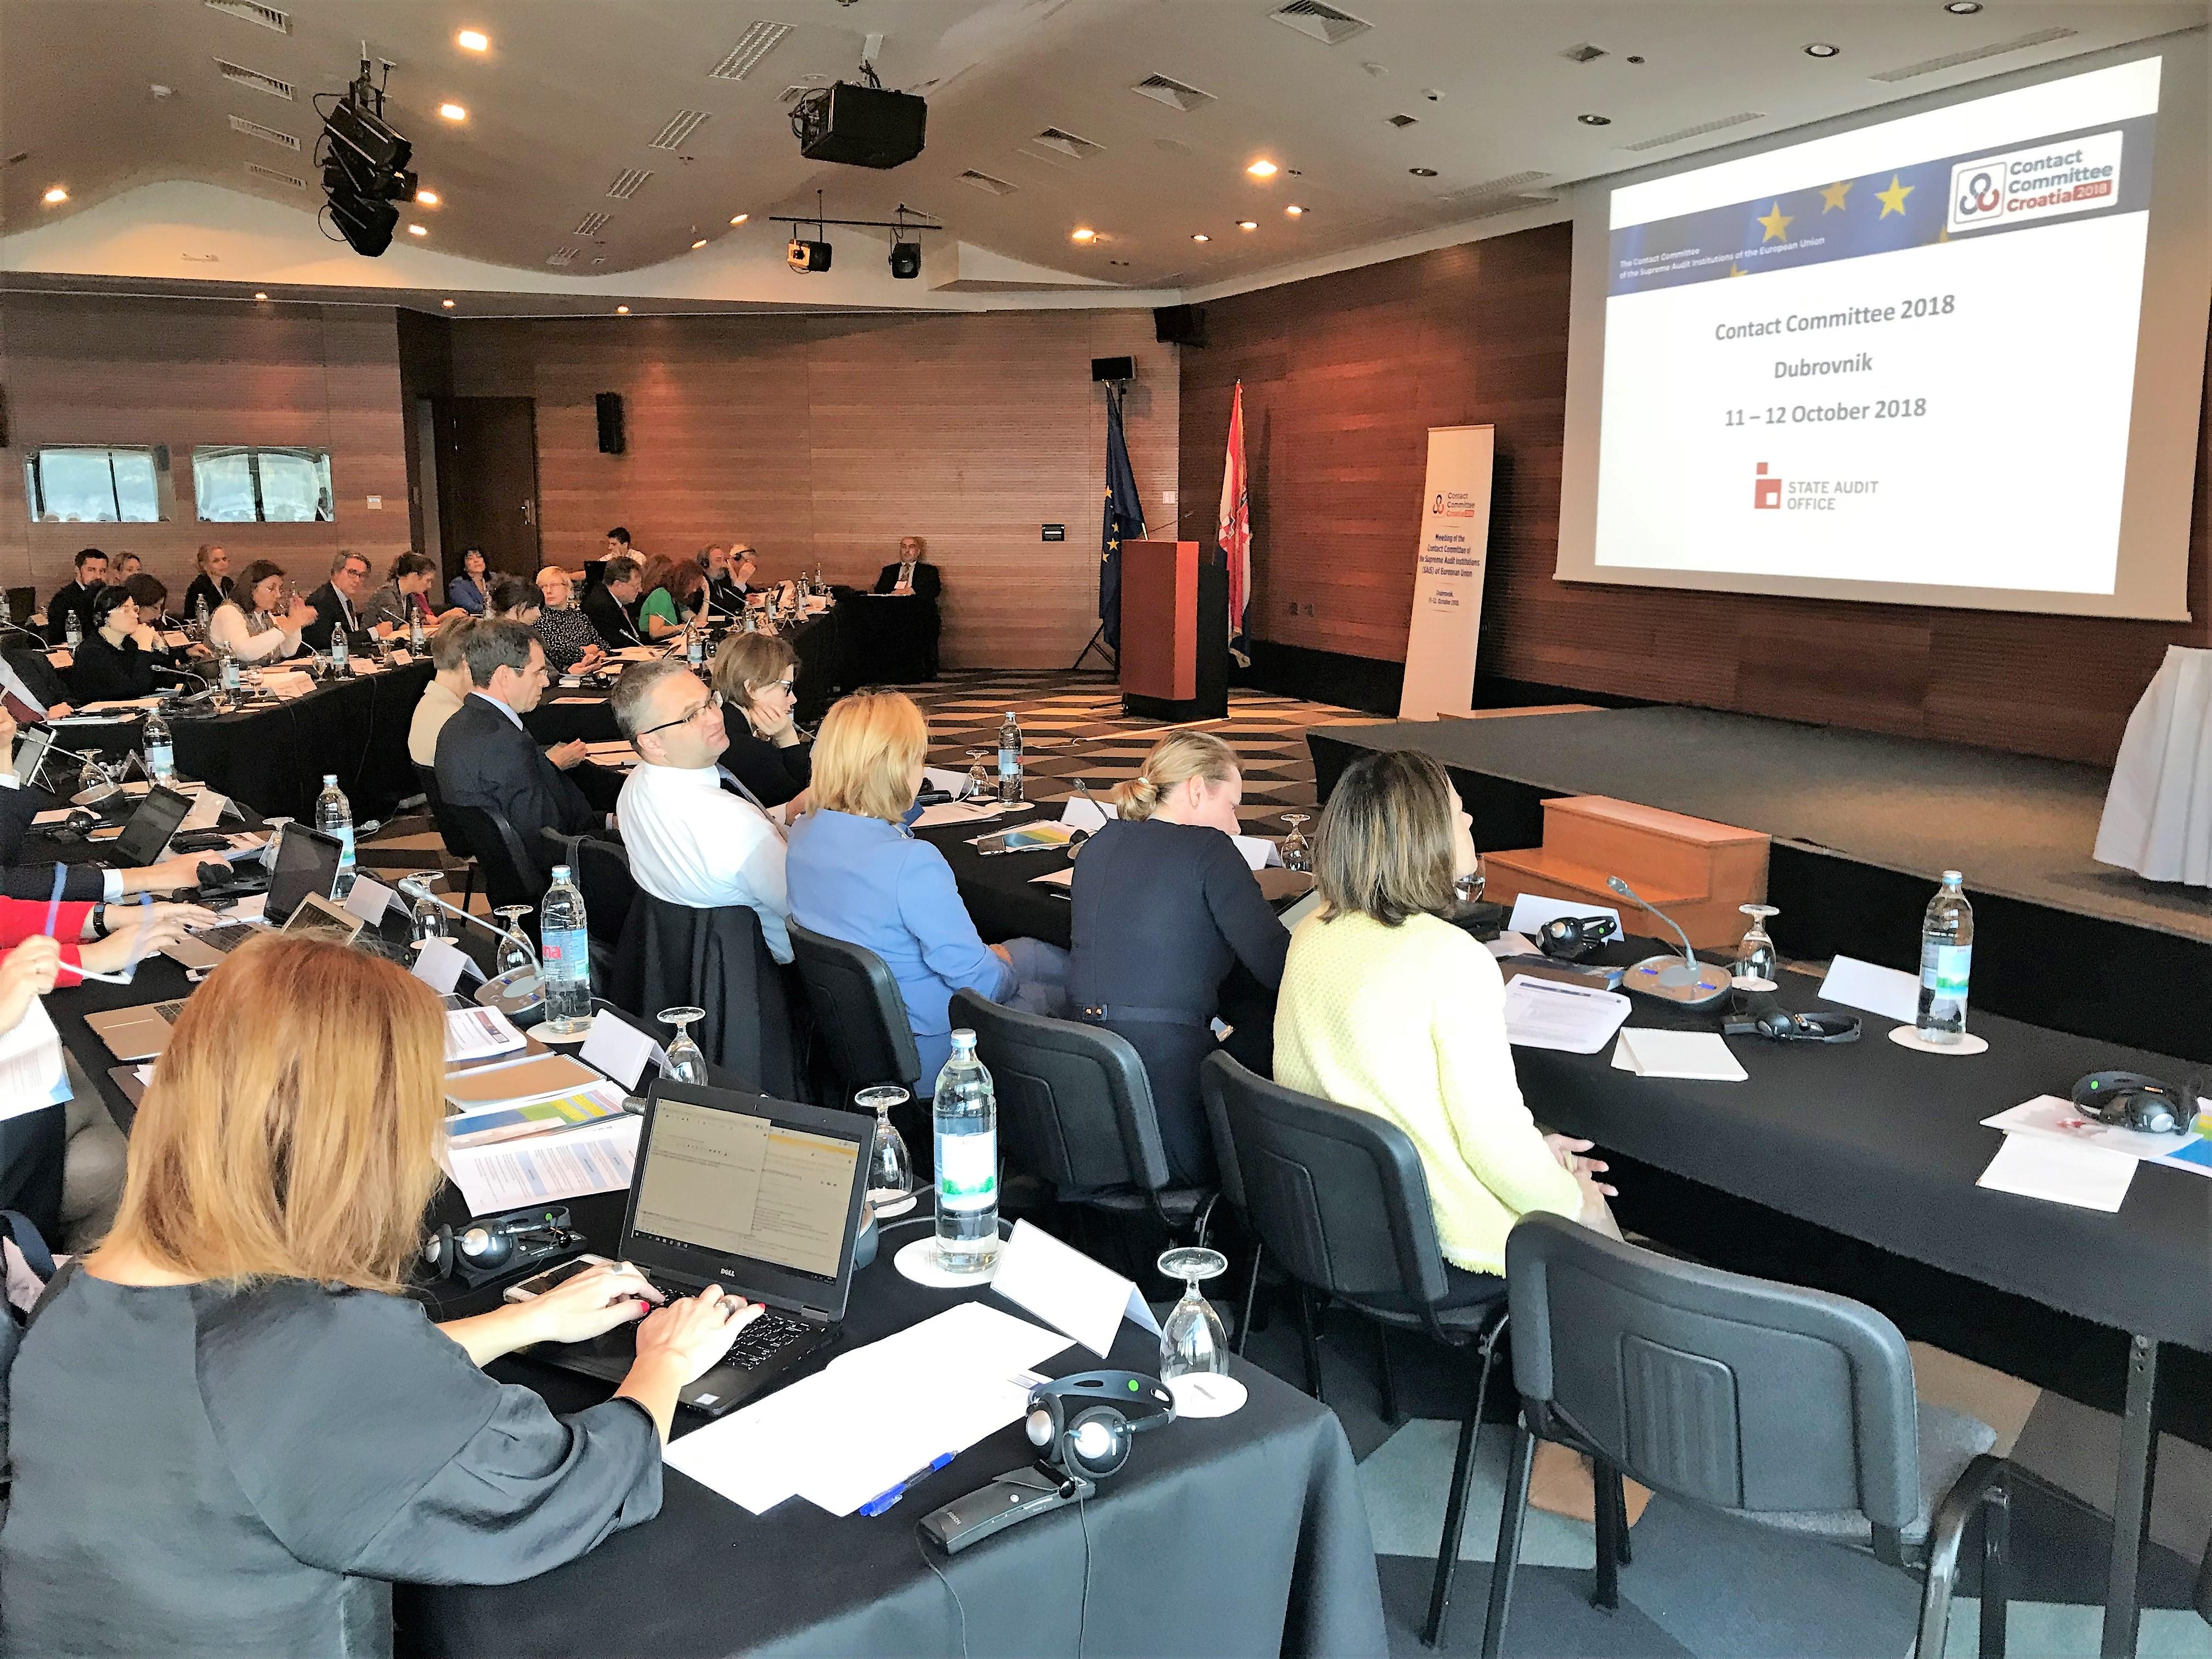 Kontaktný výbor, 11.-12. 10. 2018, Dubrovnik